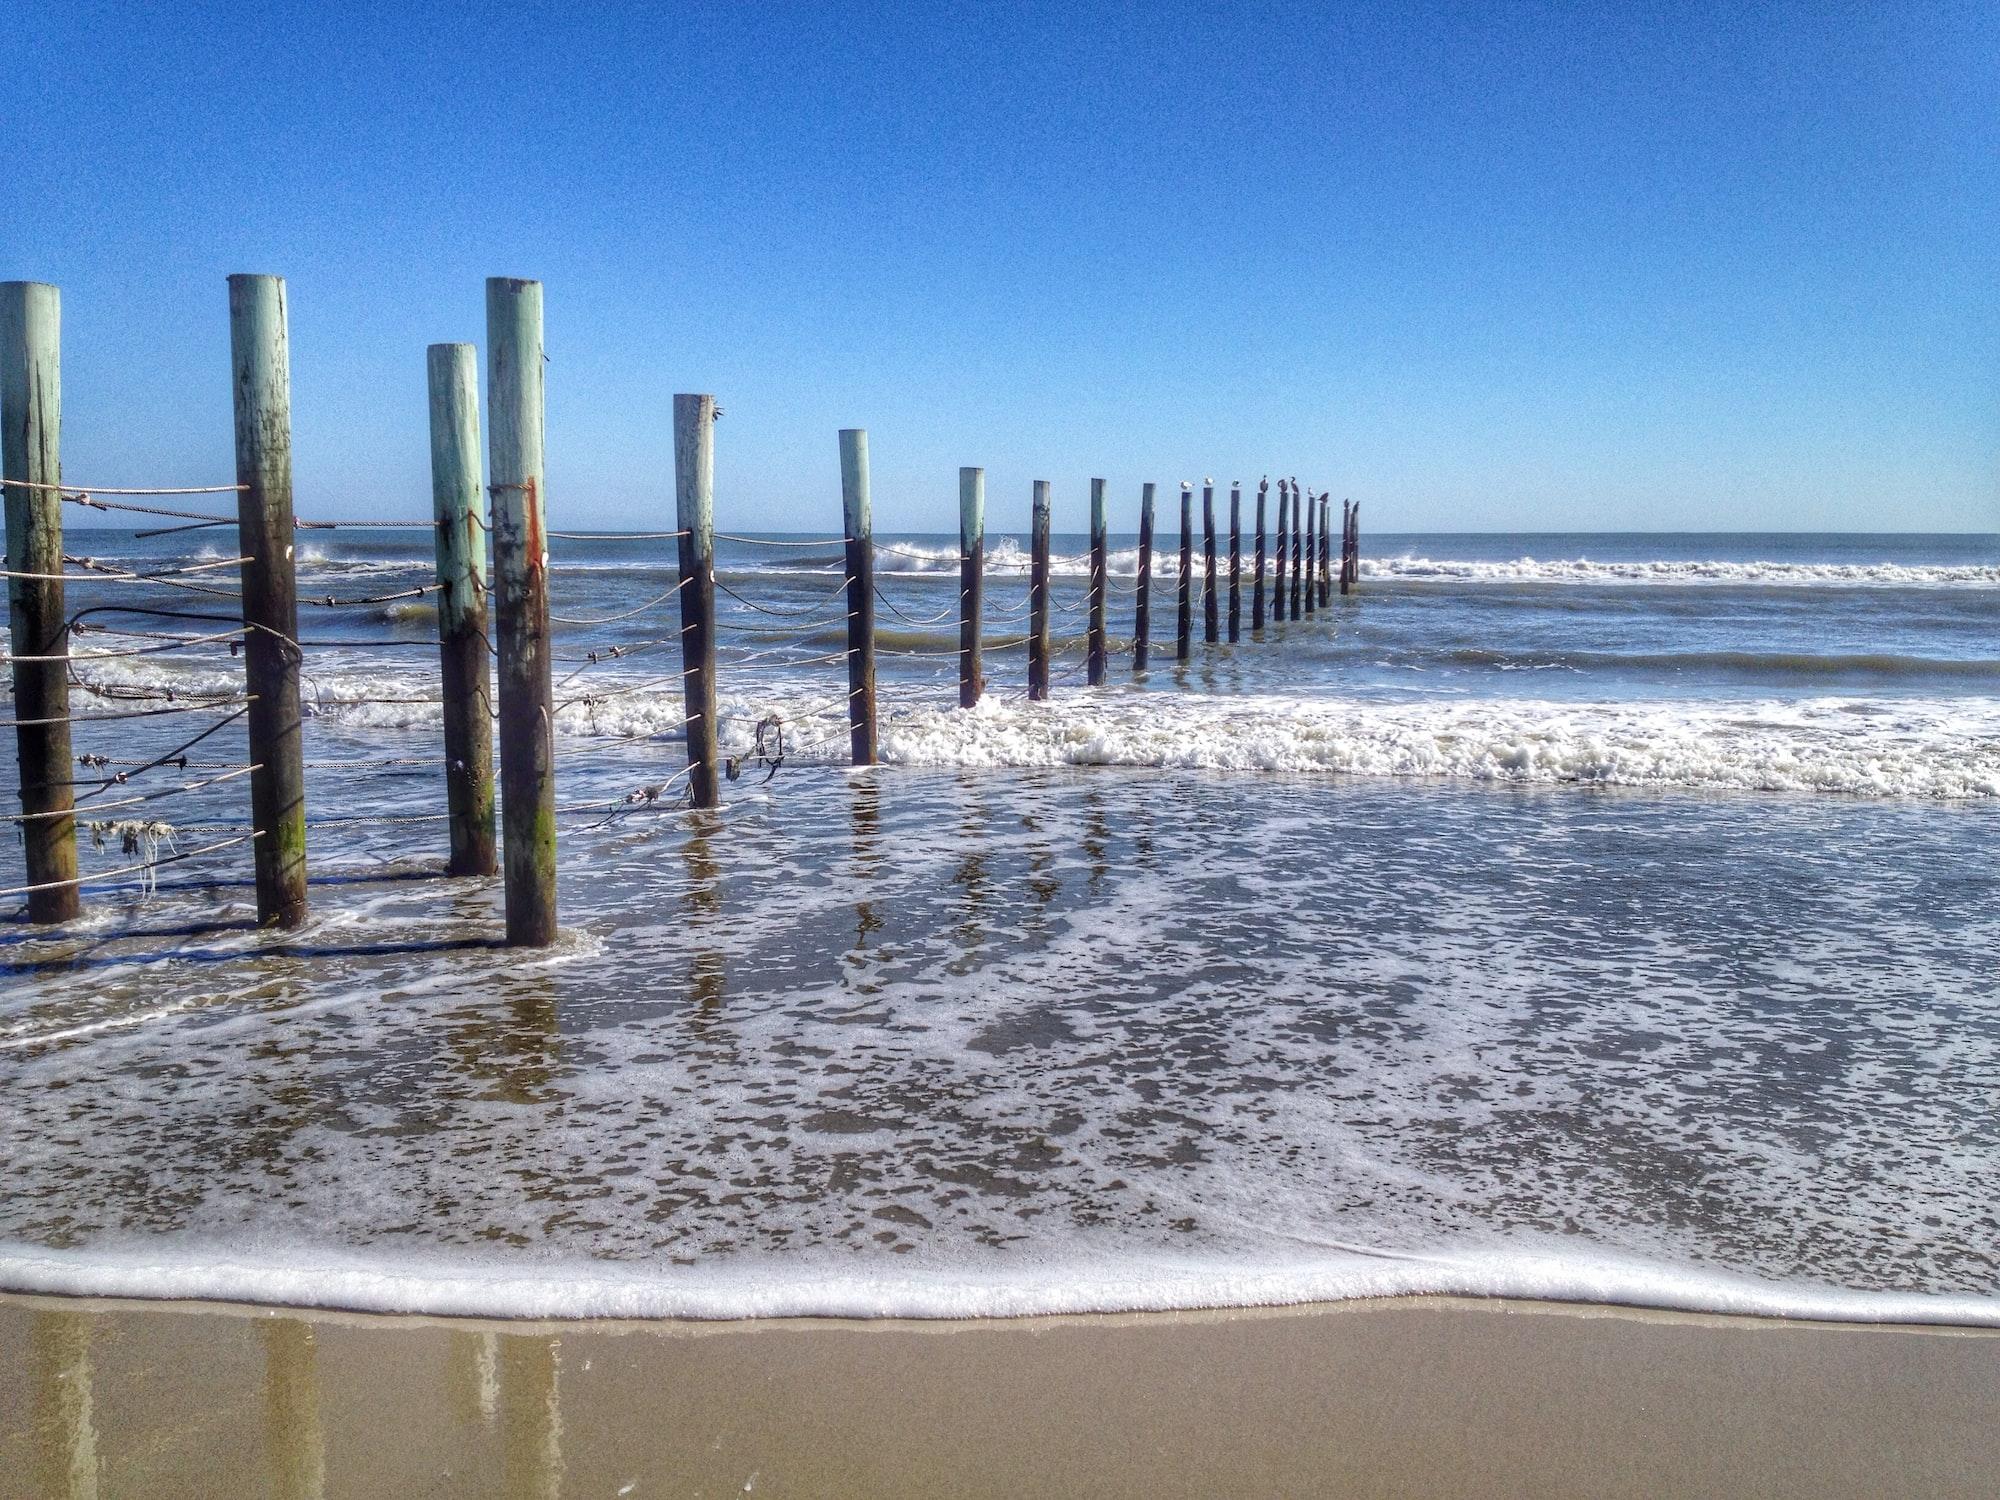 Outer Banks Shore in North Carolina